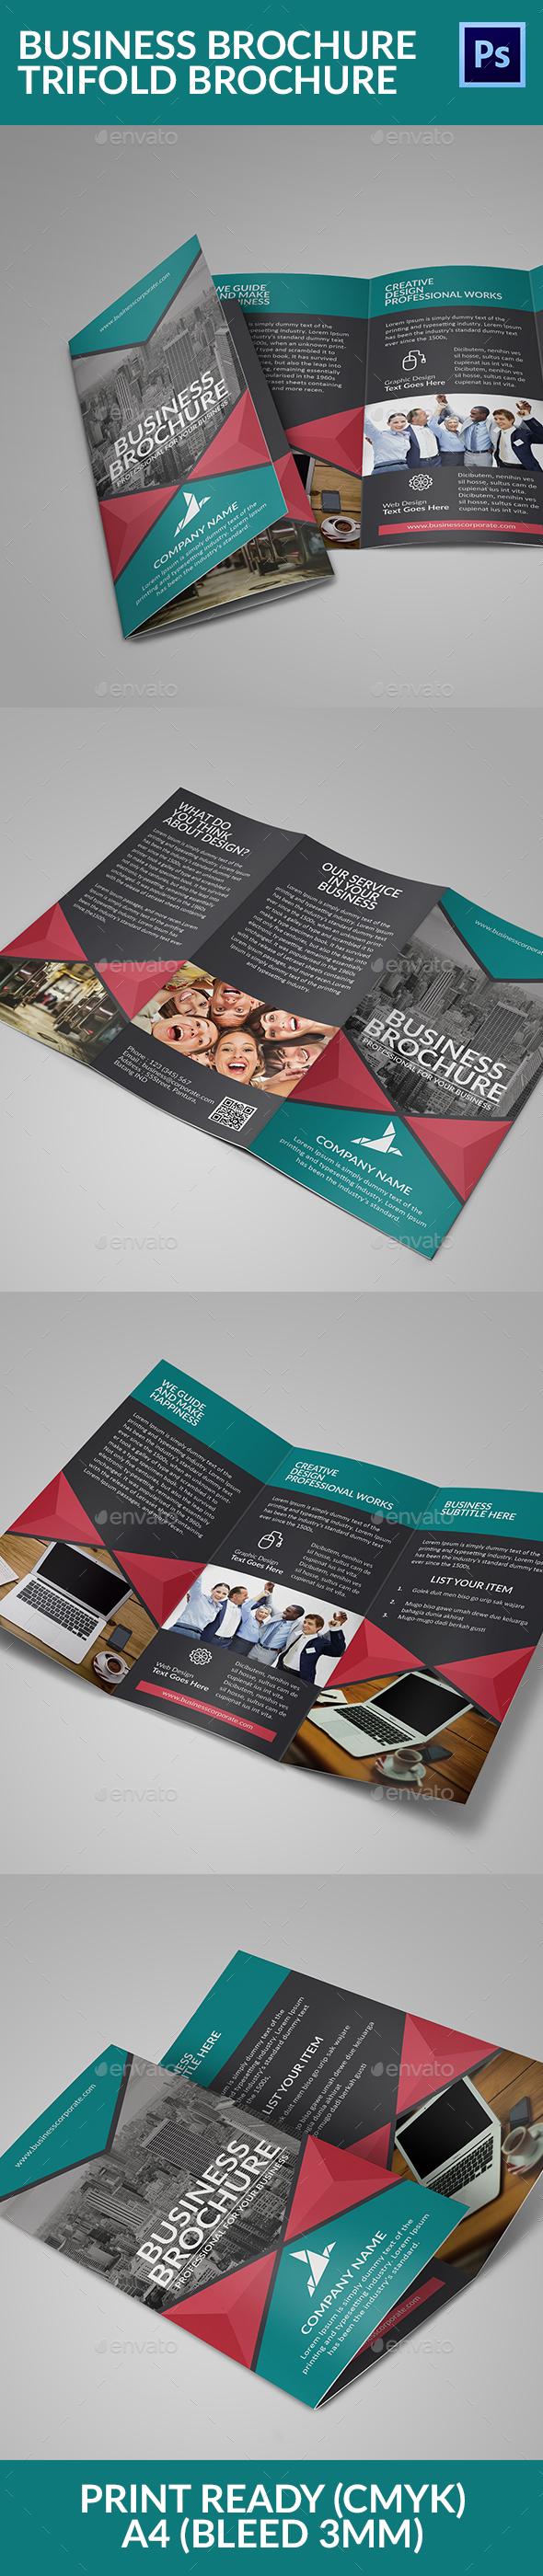 Business Brochure Trifold Brochure - Corporate Brochures